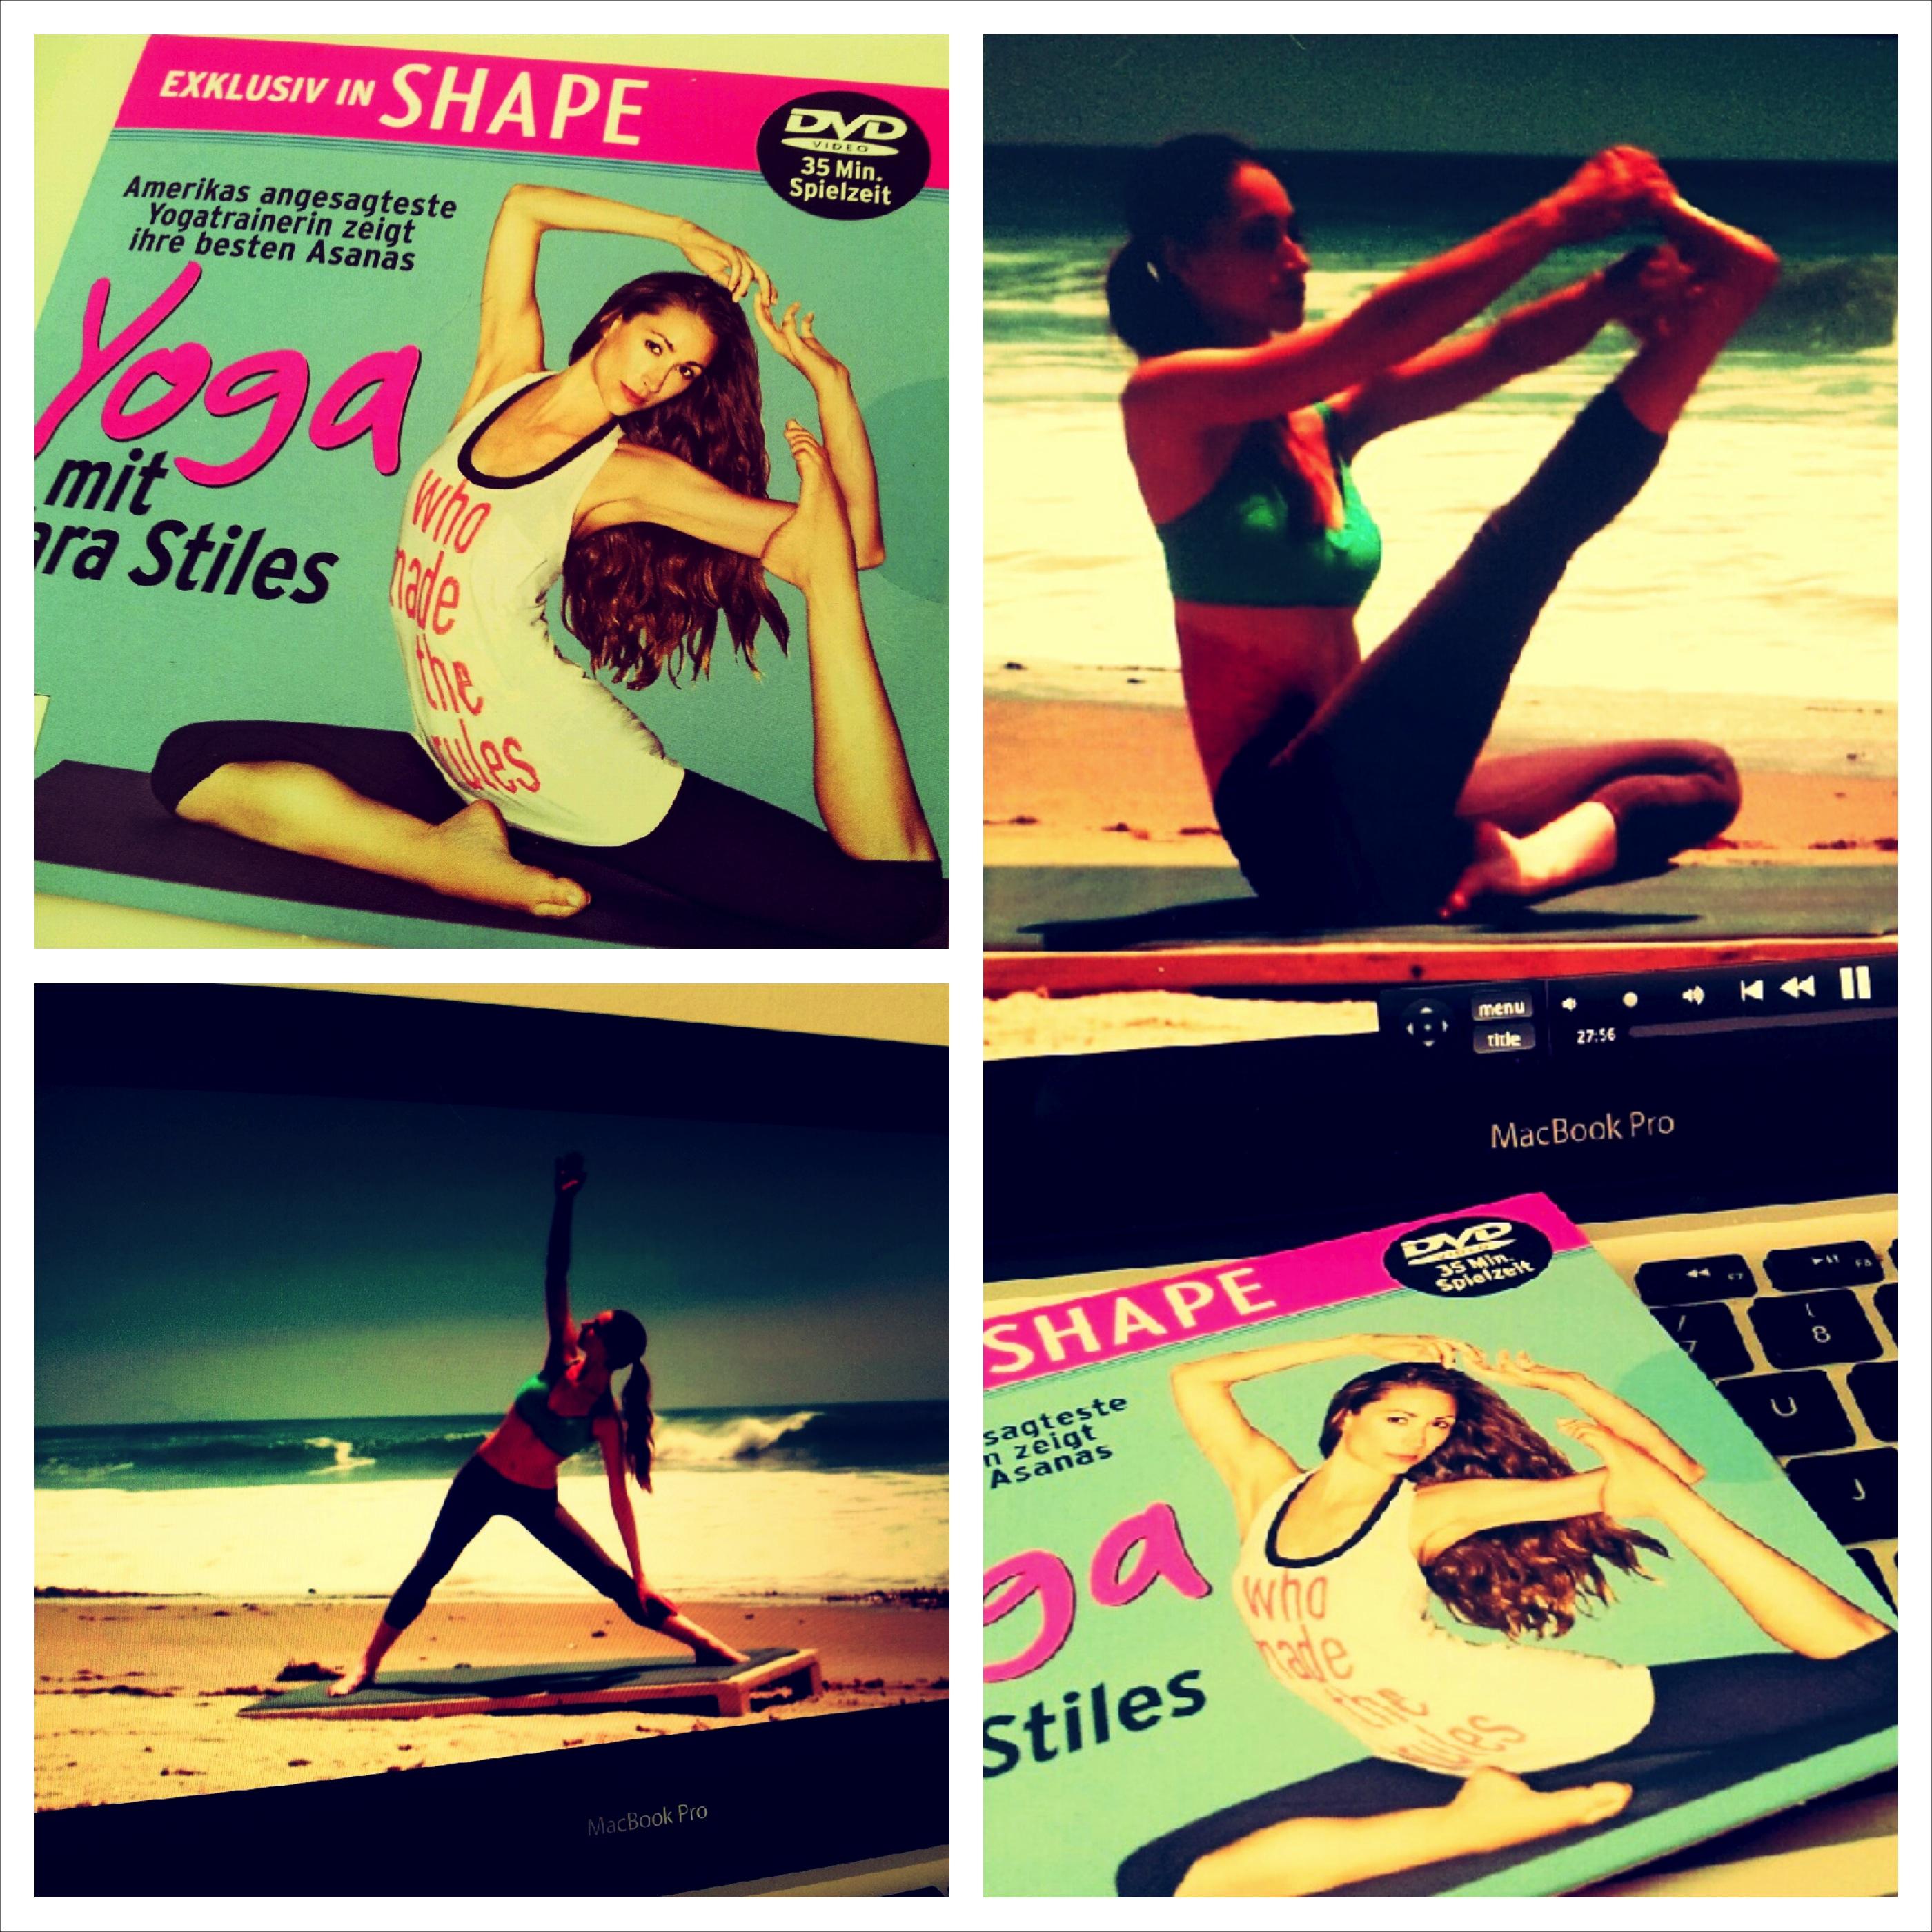 Shape Dvd Foto Collage